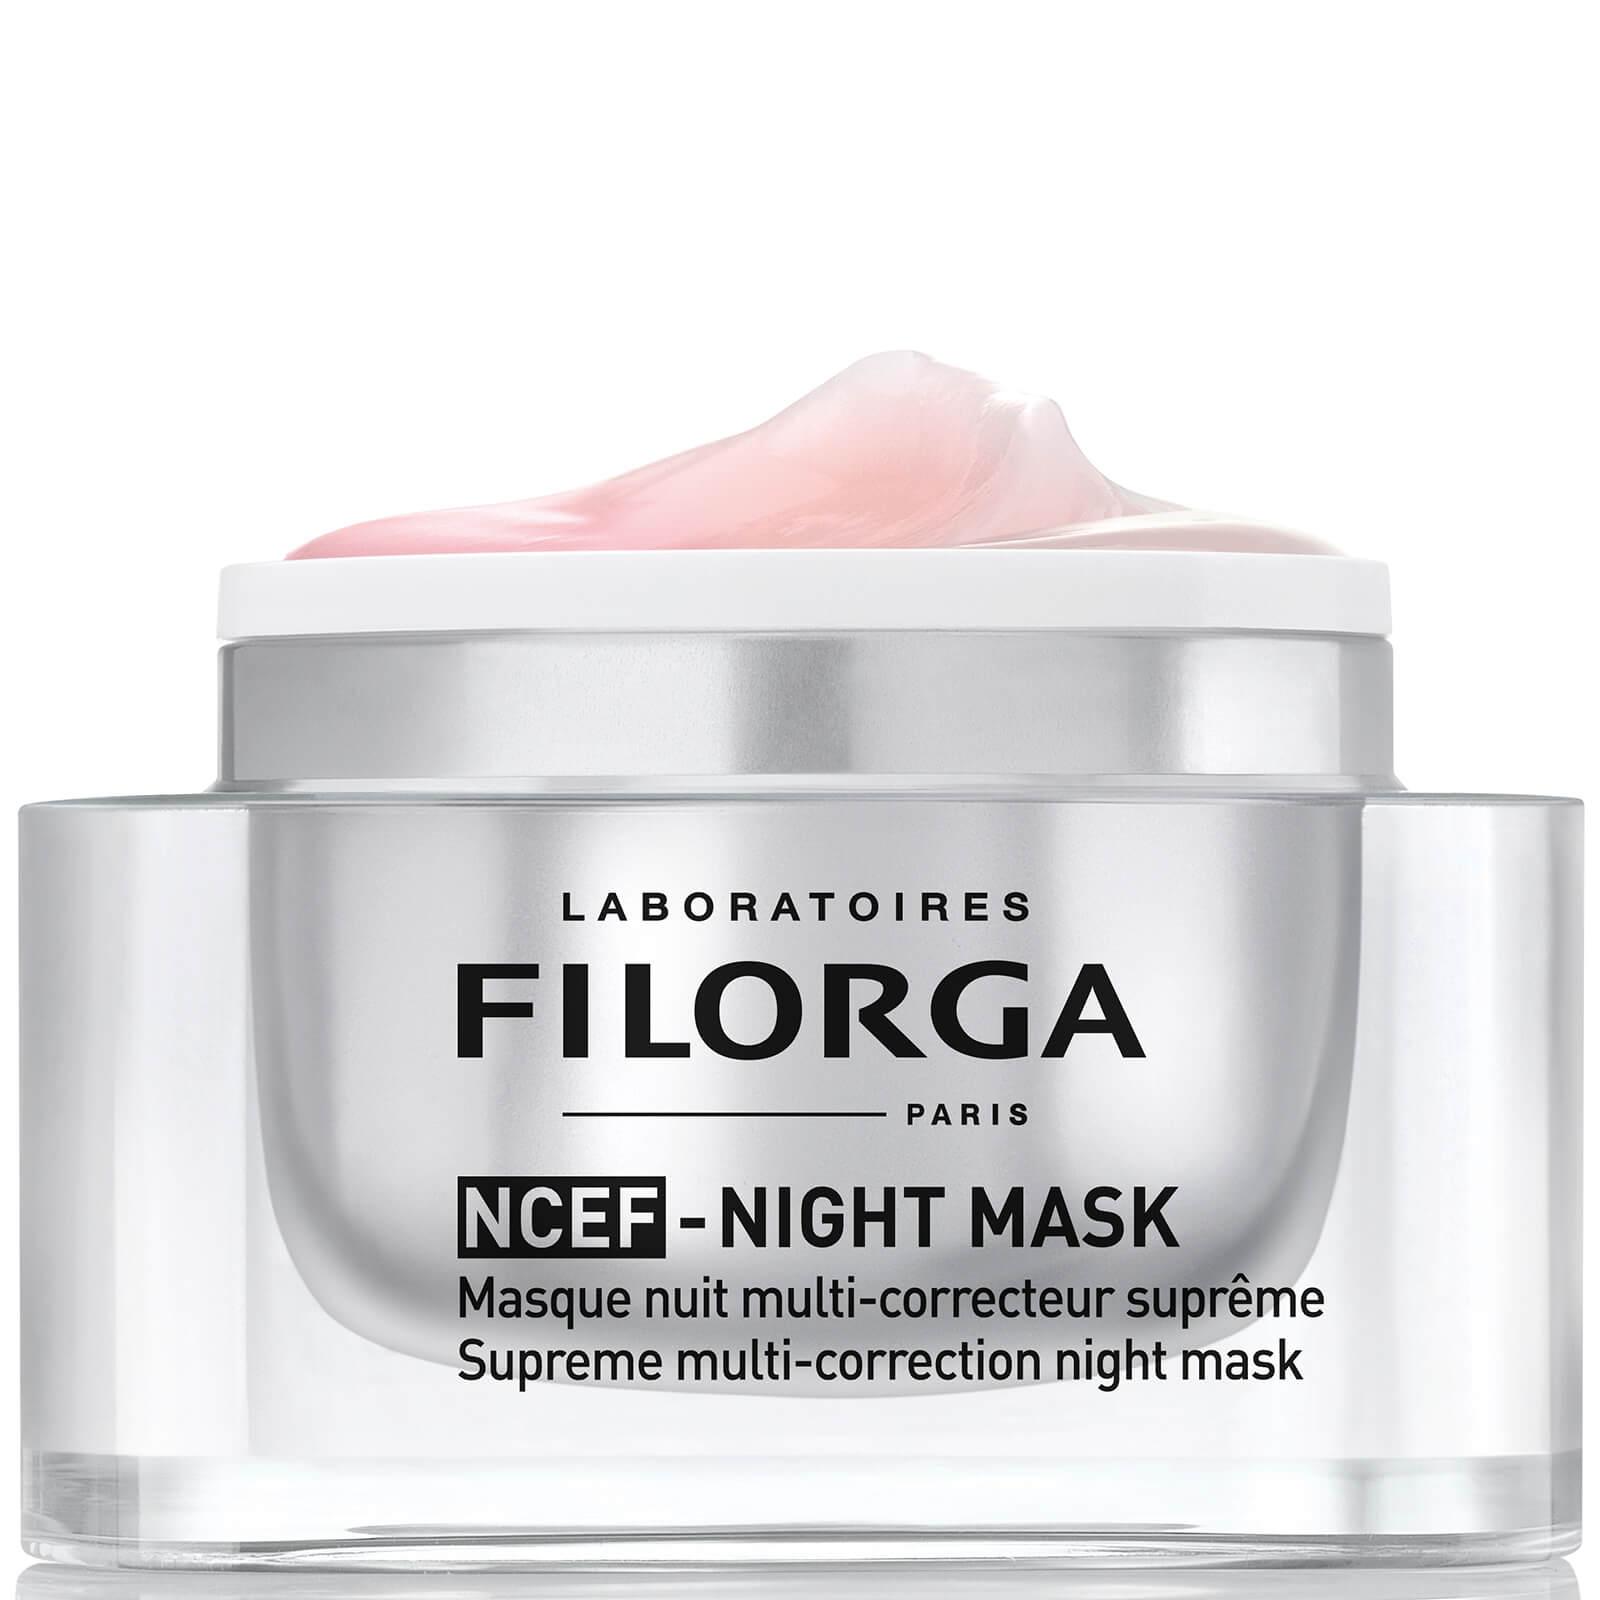 Filorga菲洛嘉 肌源赋活睡眠面膜 - 50ml